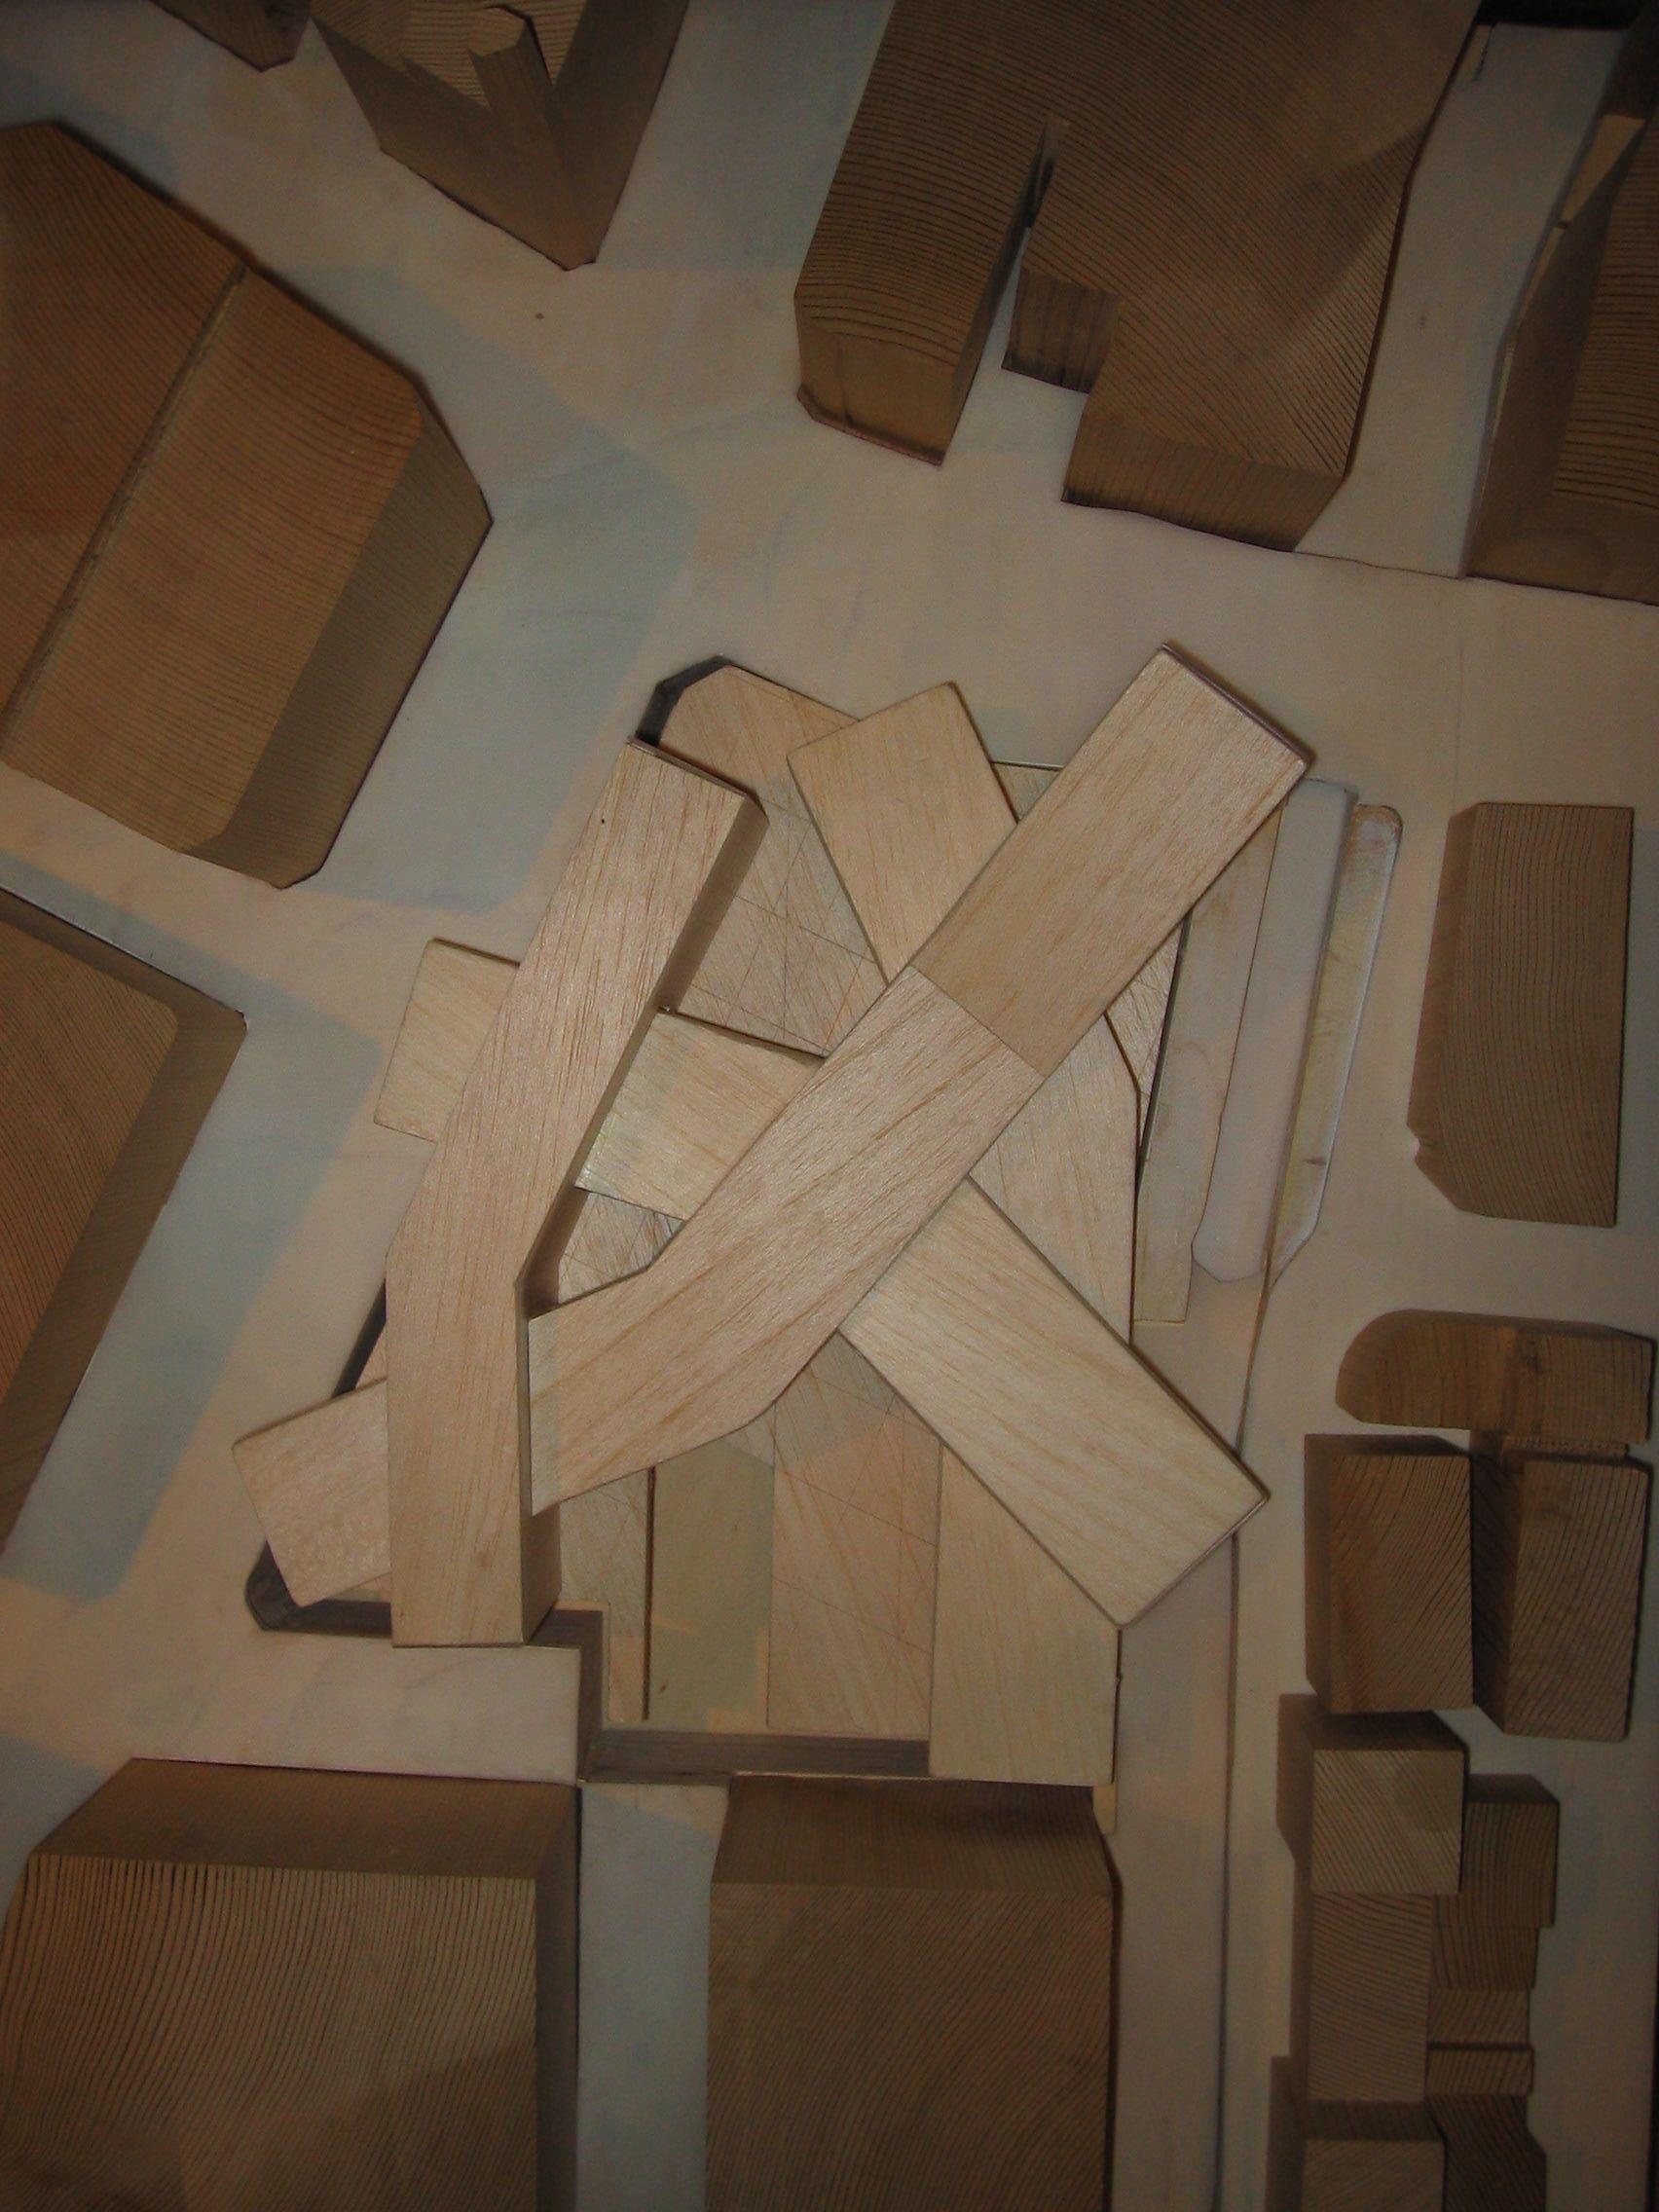 nicolas-tye-manchester-museum-4970454